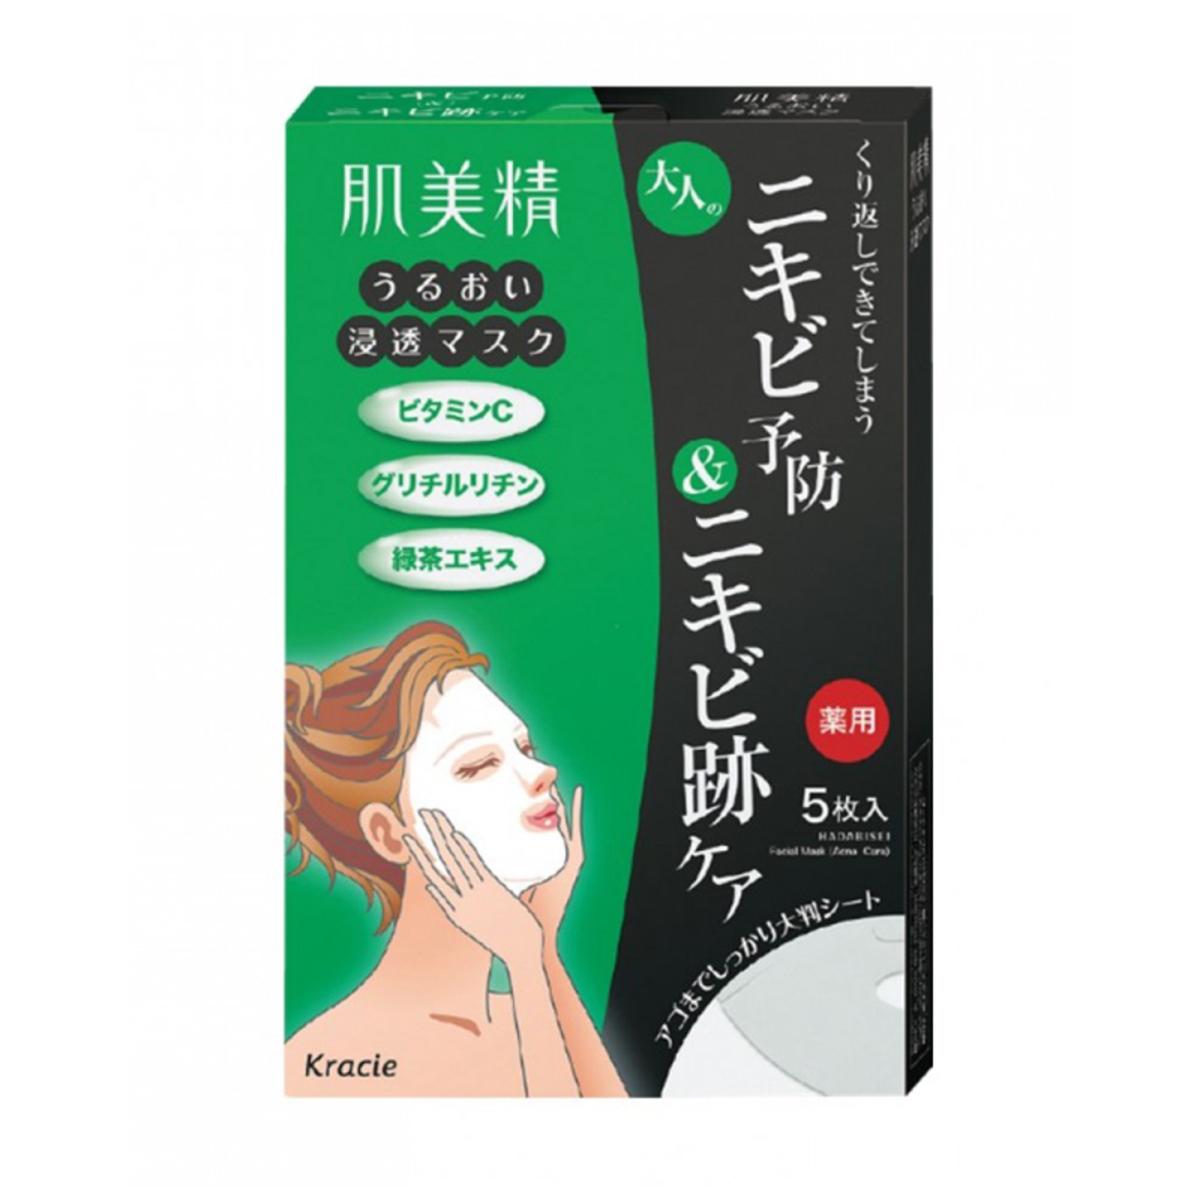 Kracie Hadabisei Moisturizing Face Mask (Tightening) 肌美精 保濕滲透面膜 ( 緊緻柔滑) 一盒4片  肌美精黑灰盒